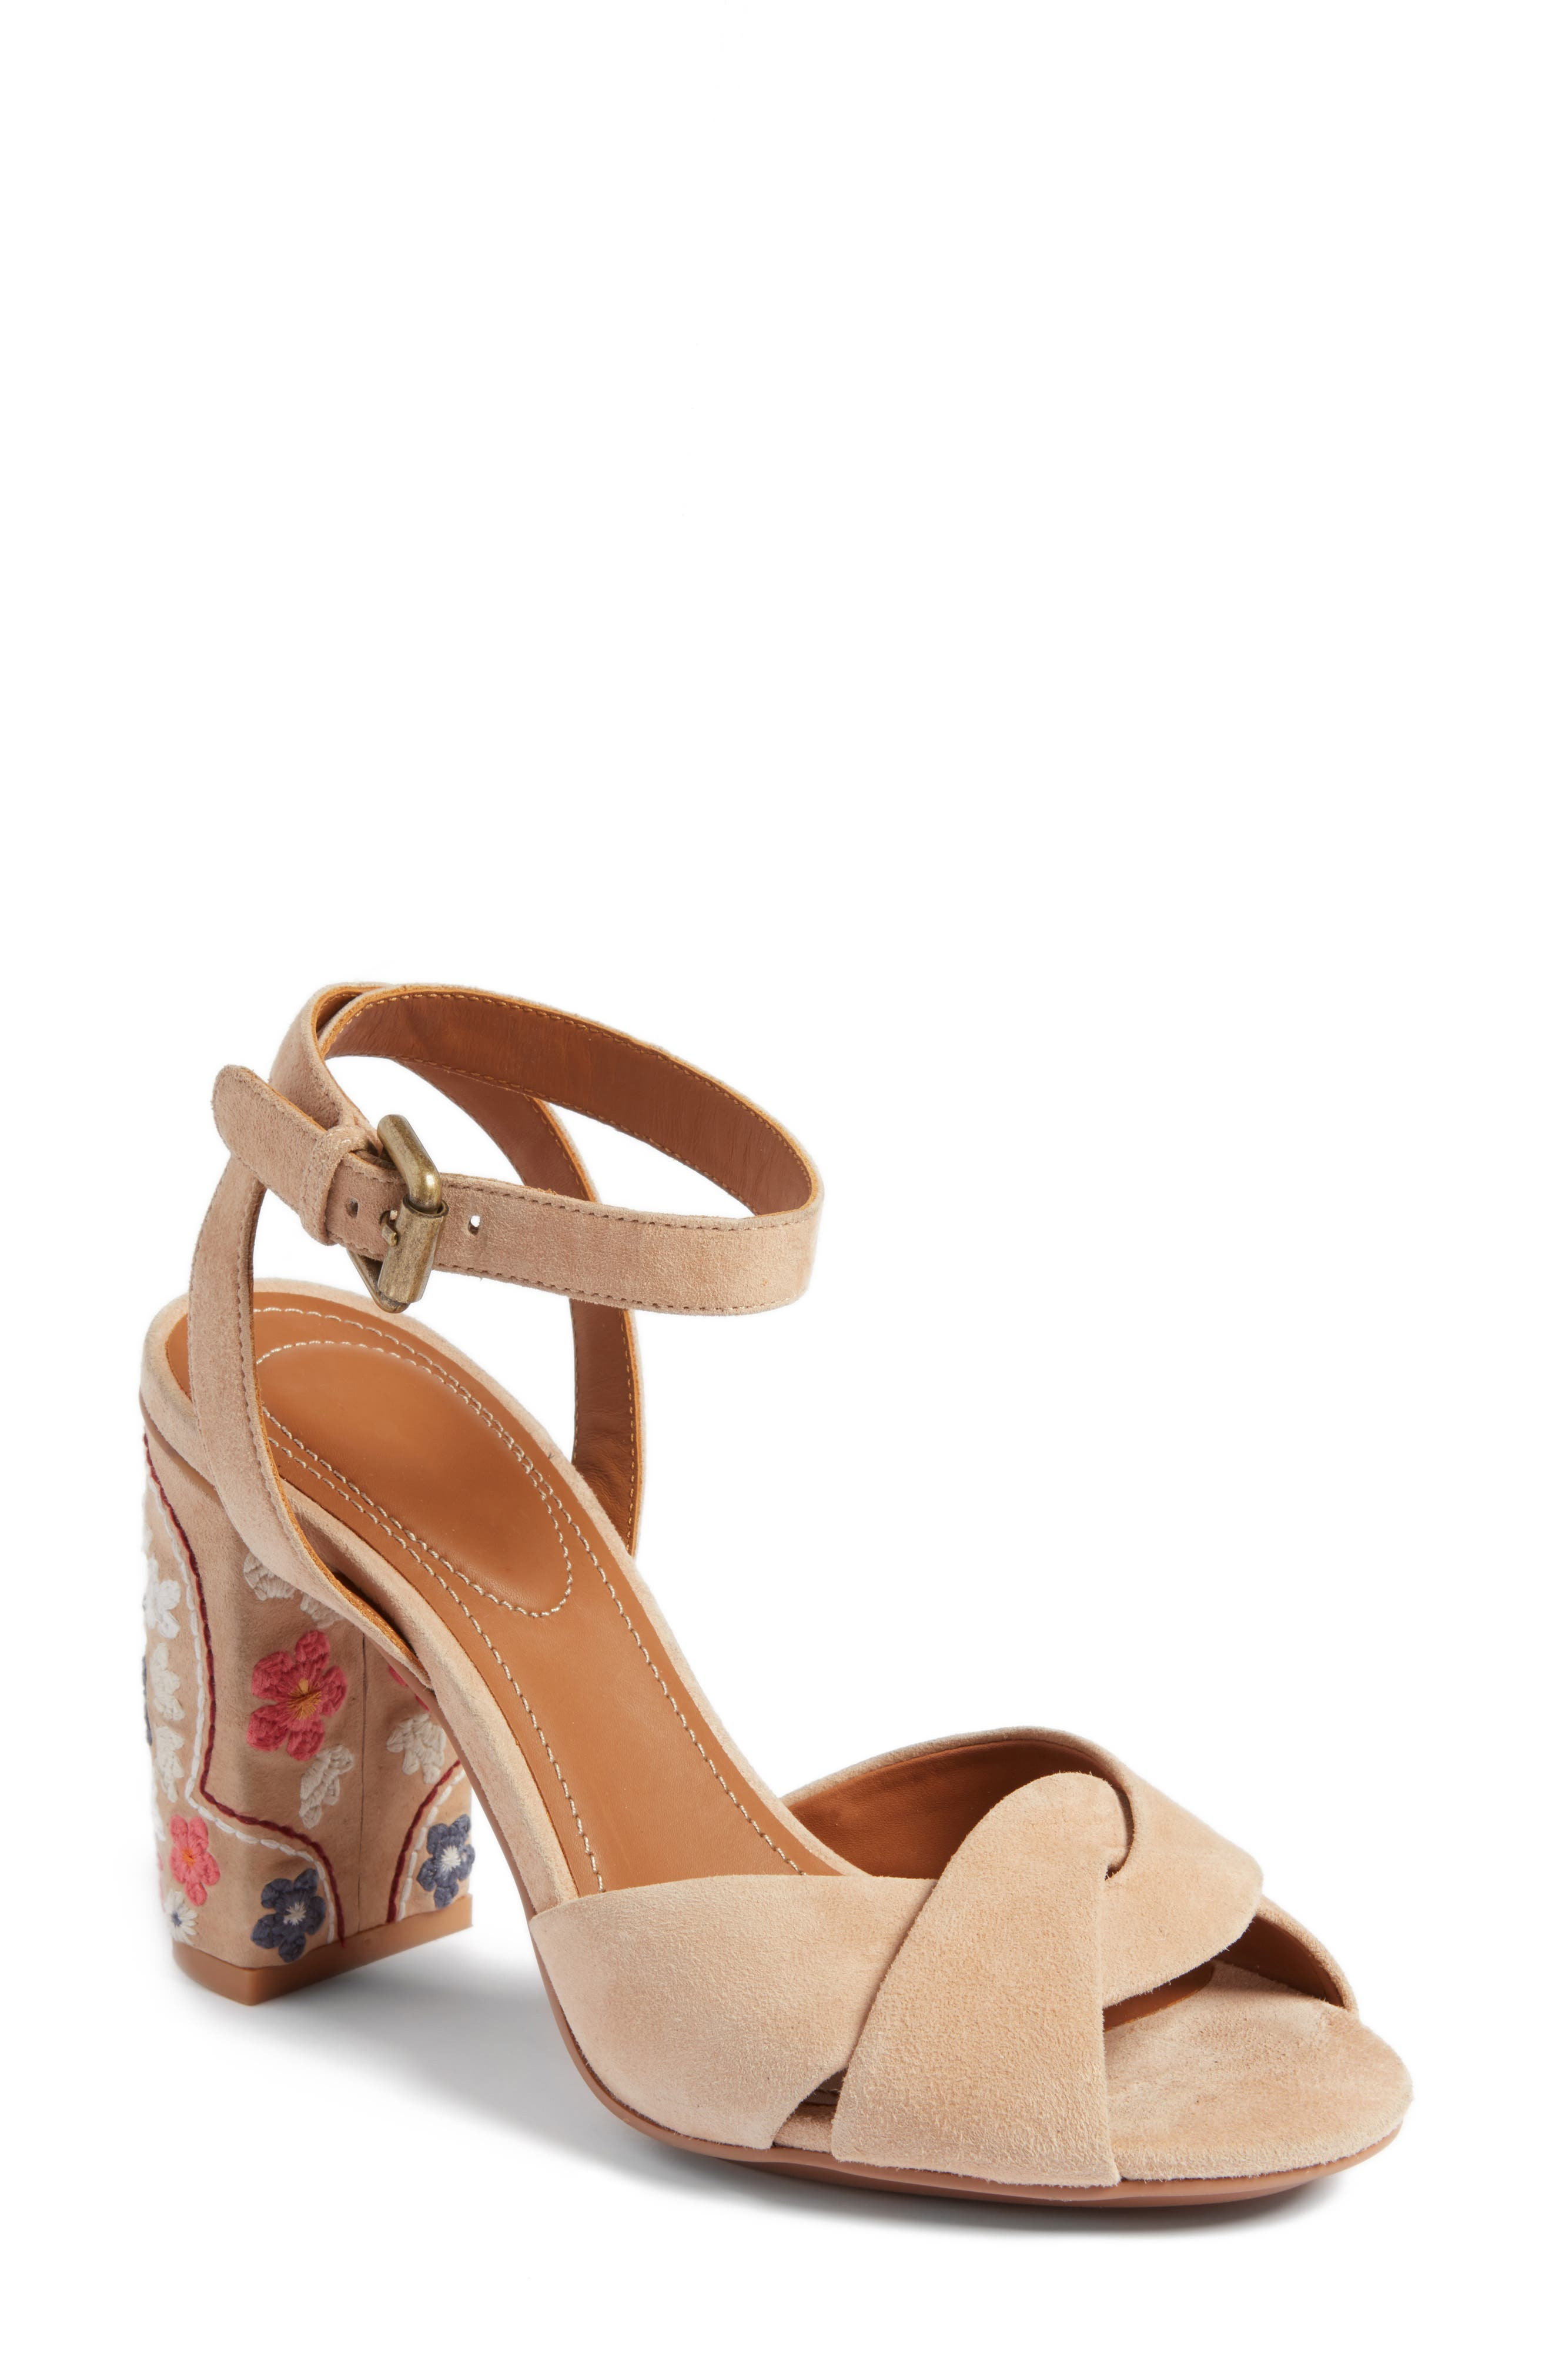 Gayla Embroidered Block Heel Sandal,                         Main,                         color, 250